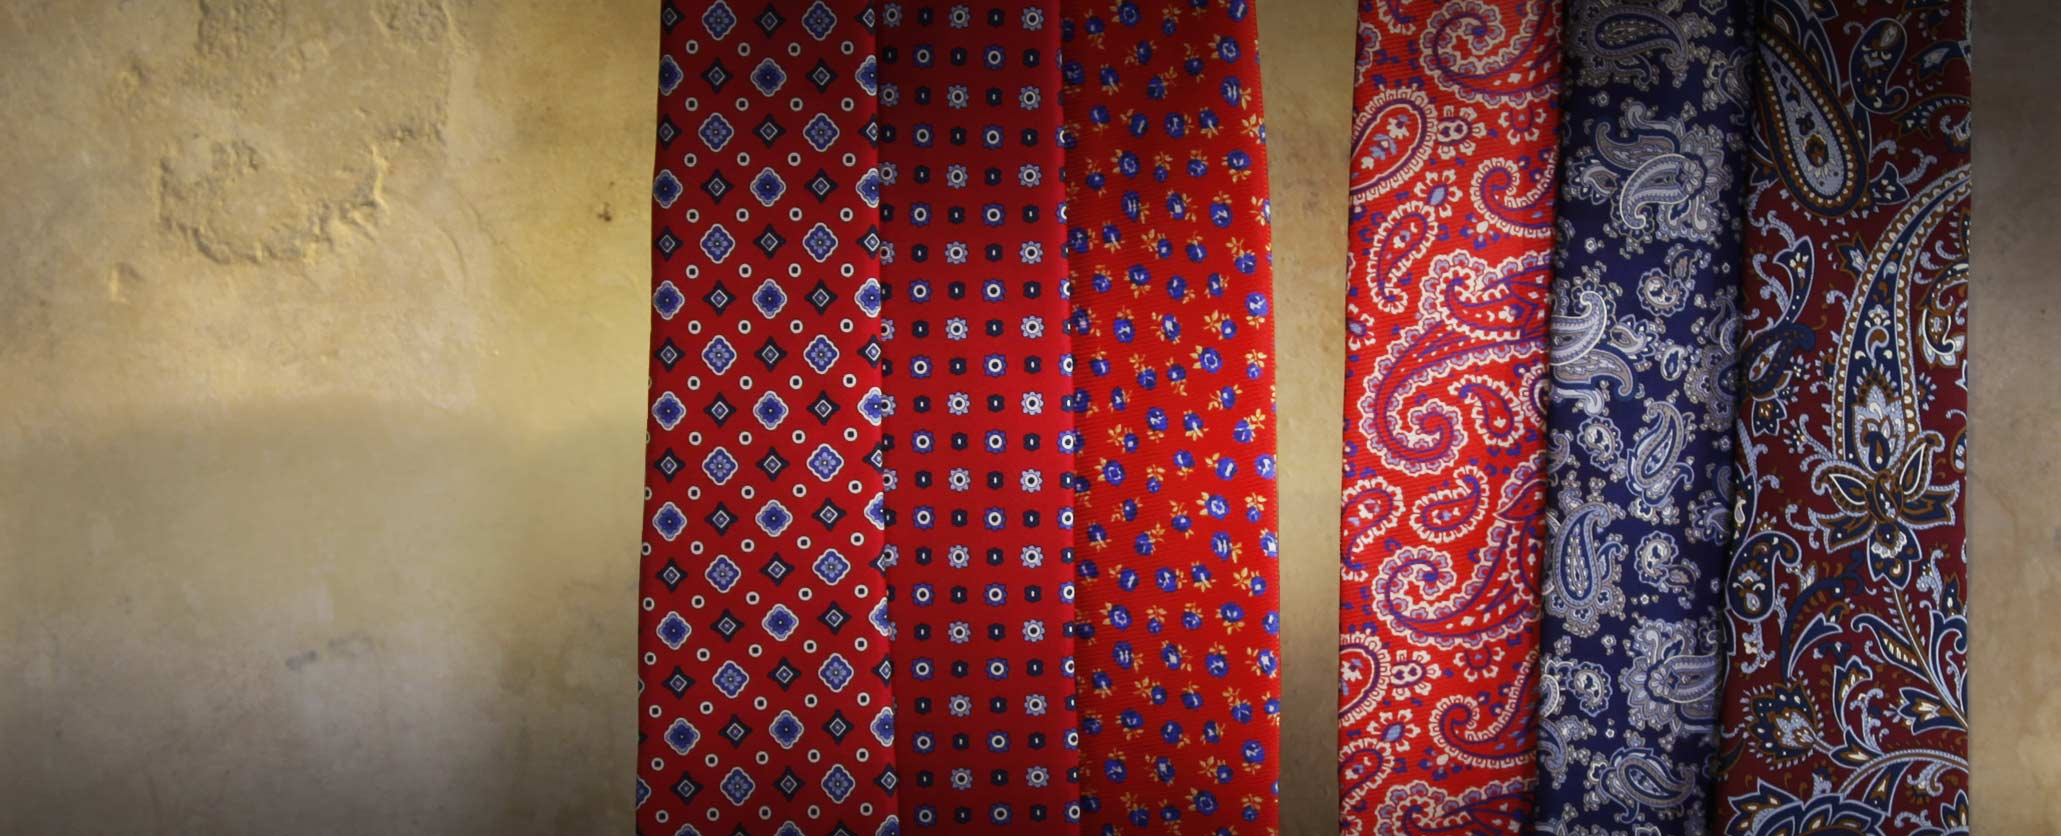 cravatte-11-torredarte